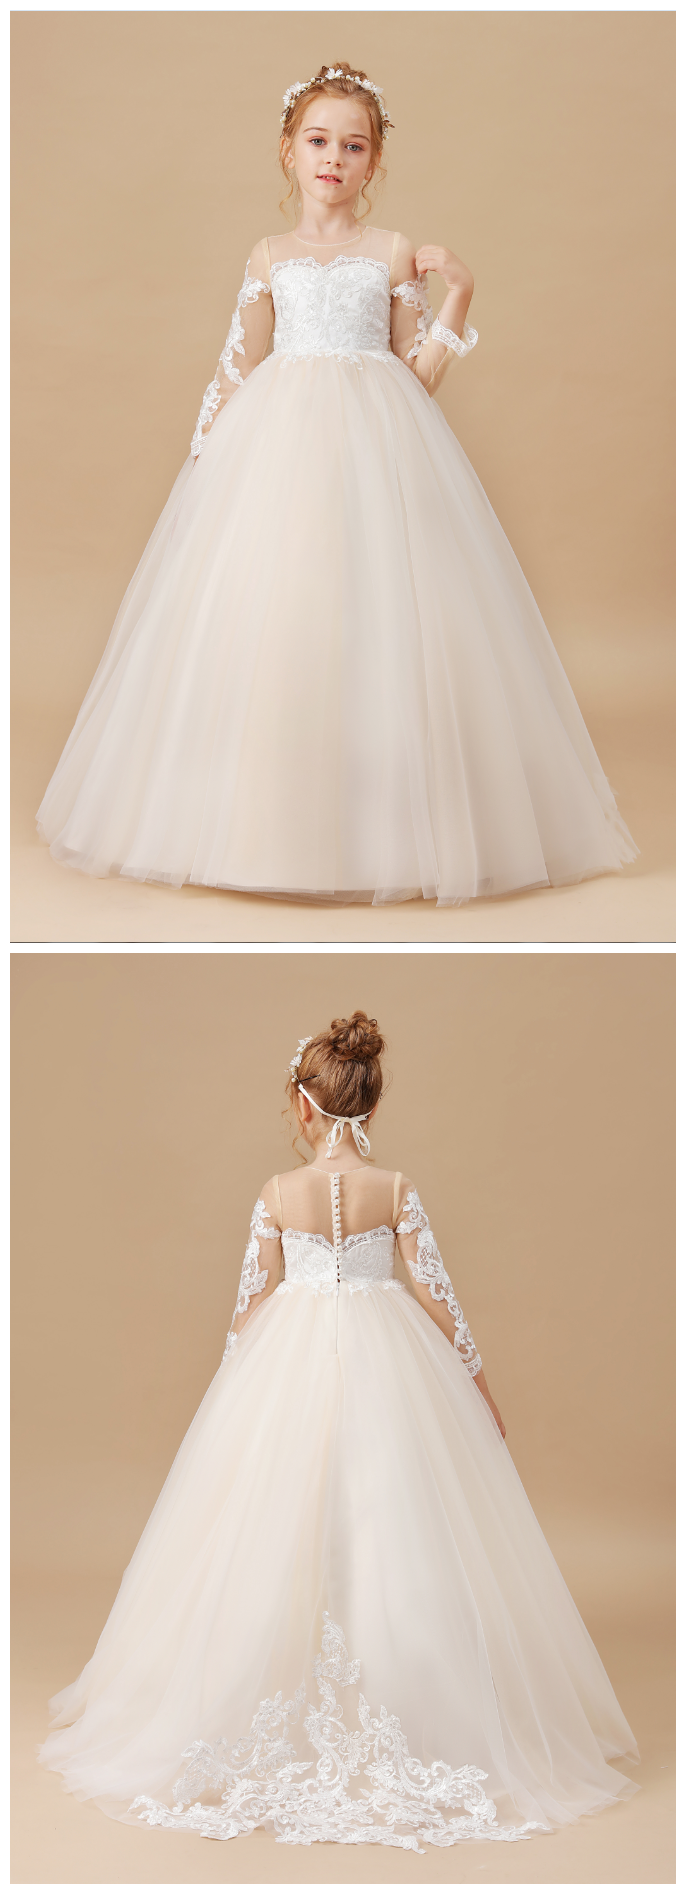 Flower Girl Dresses,Banquet Dress Baby Kids Clothes Wedding Children Clothing